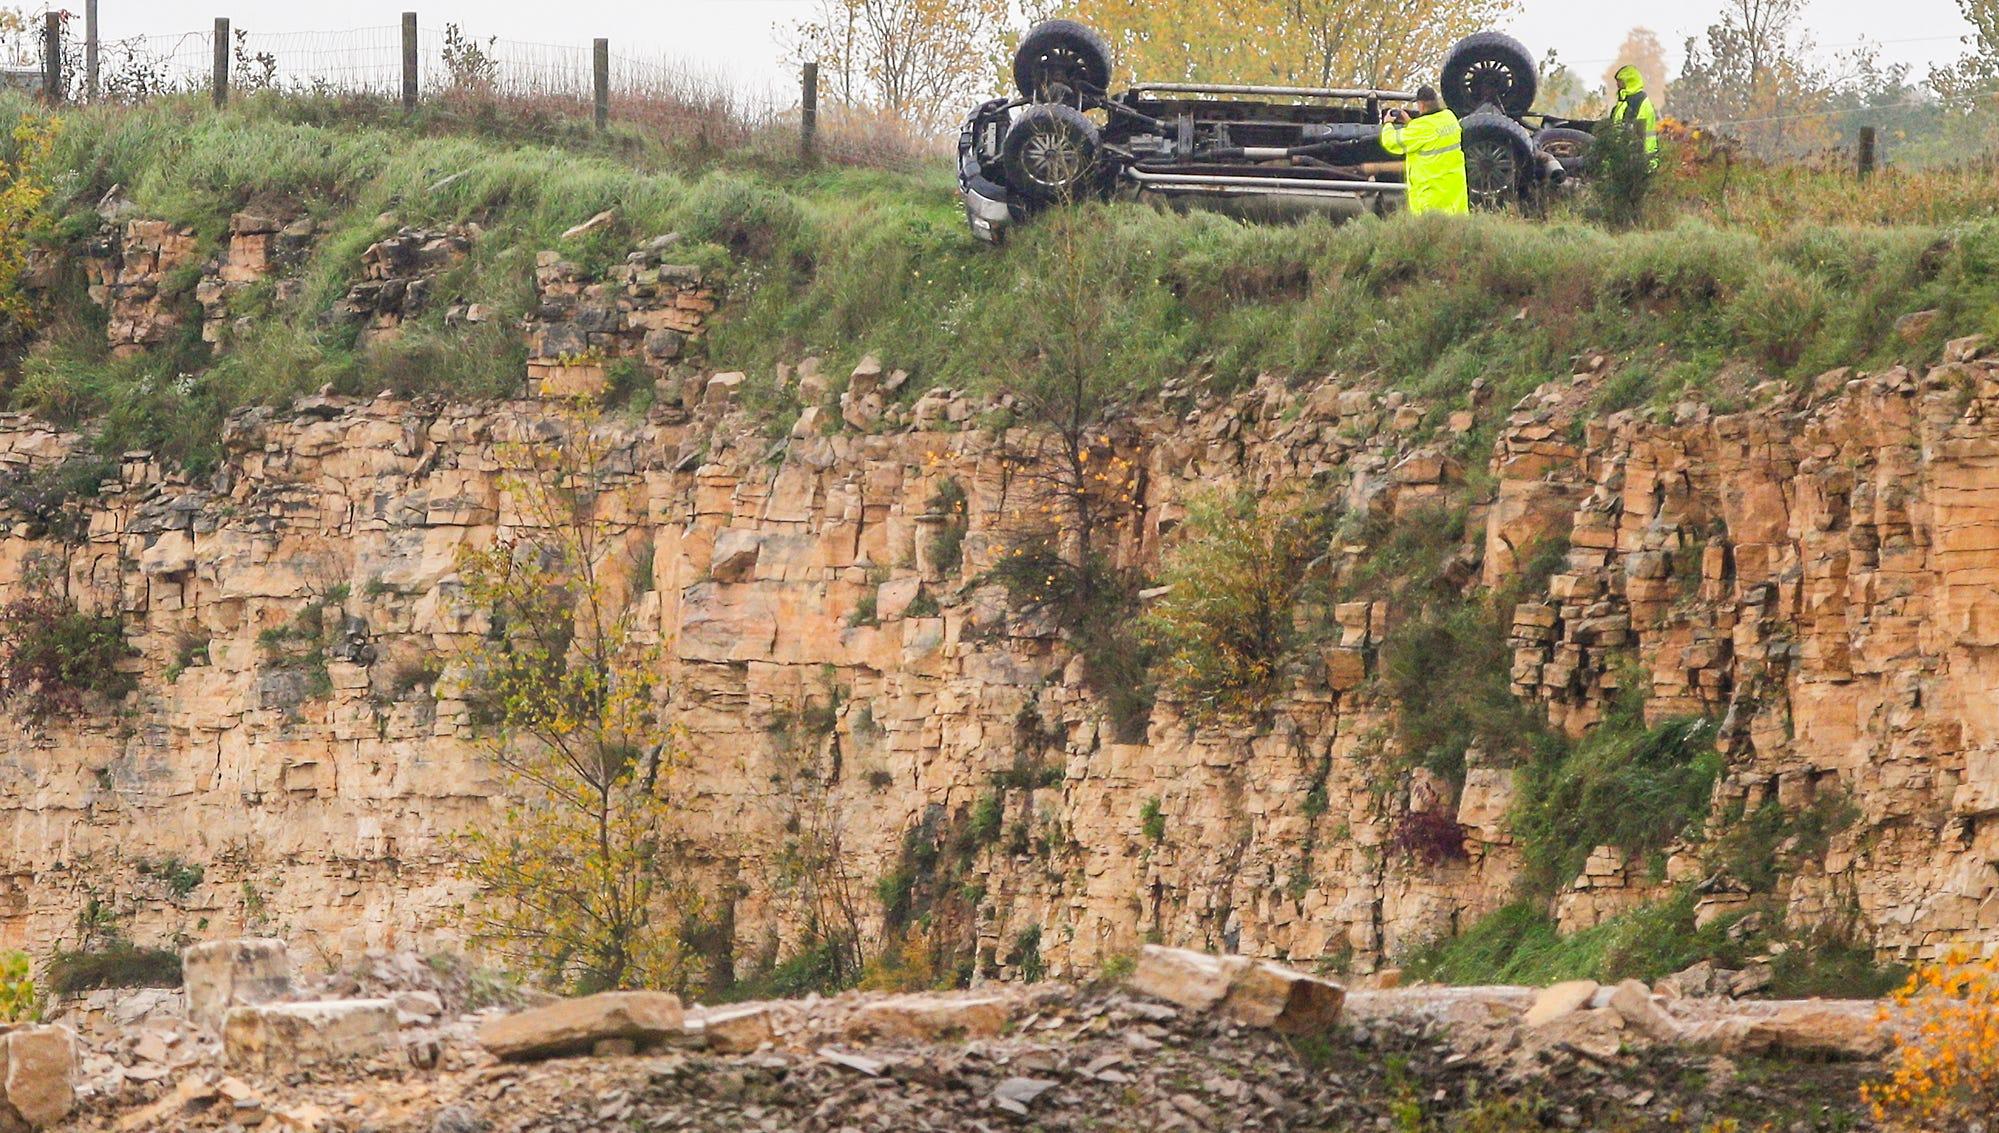 Neosho man dies in rollover which sent him plummeting into quarry below Interstate 41